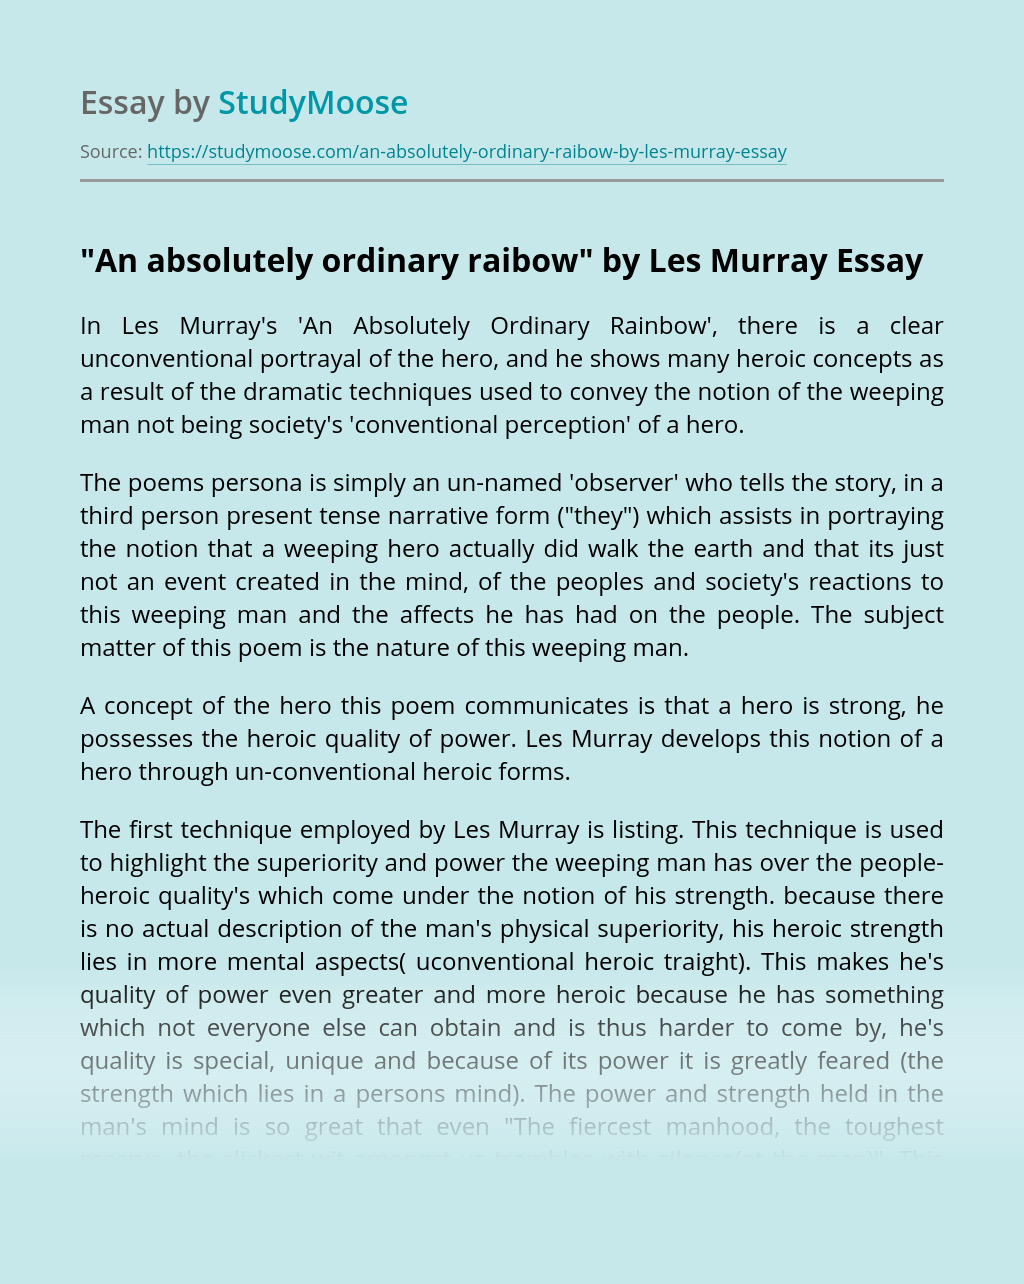 """An absolutely ordinary raibow"" by Les Murray"